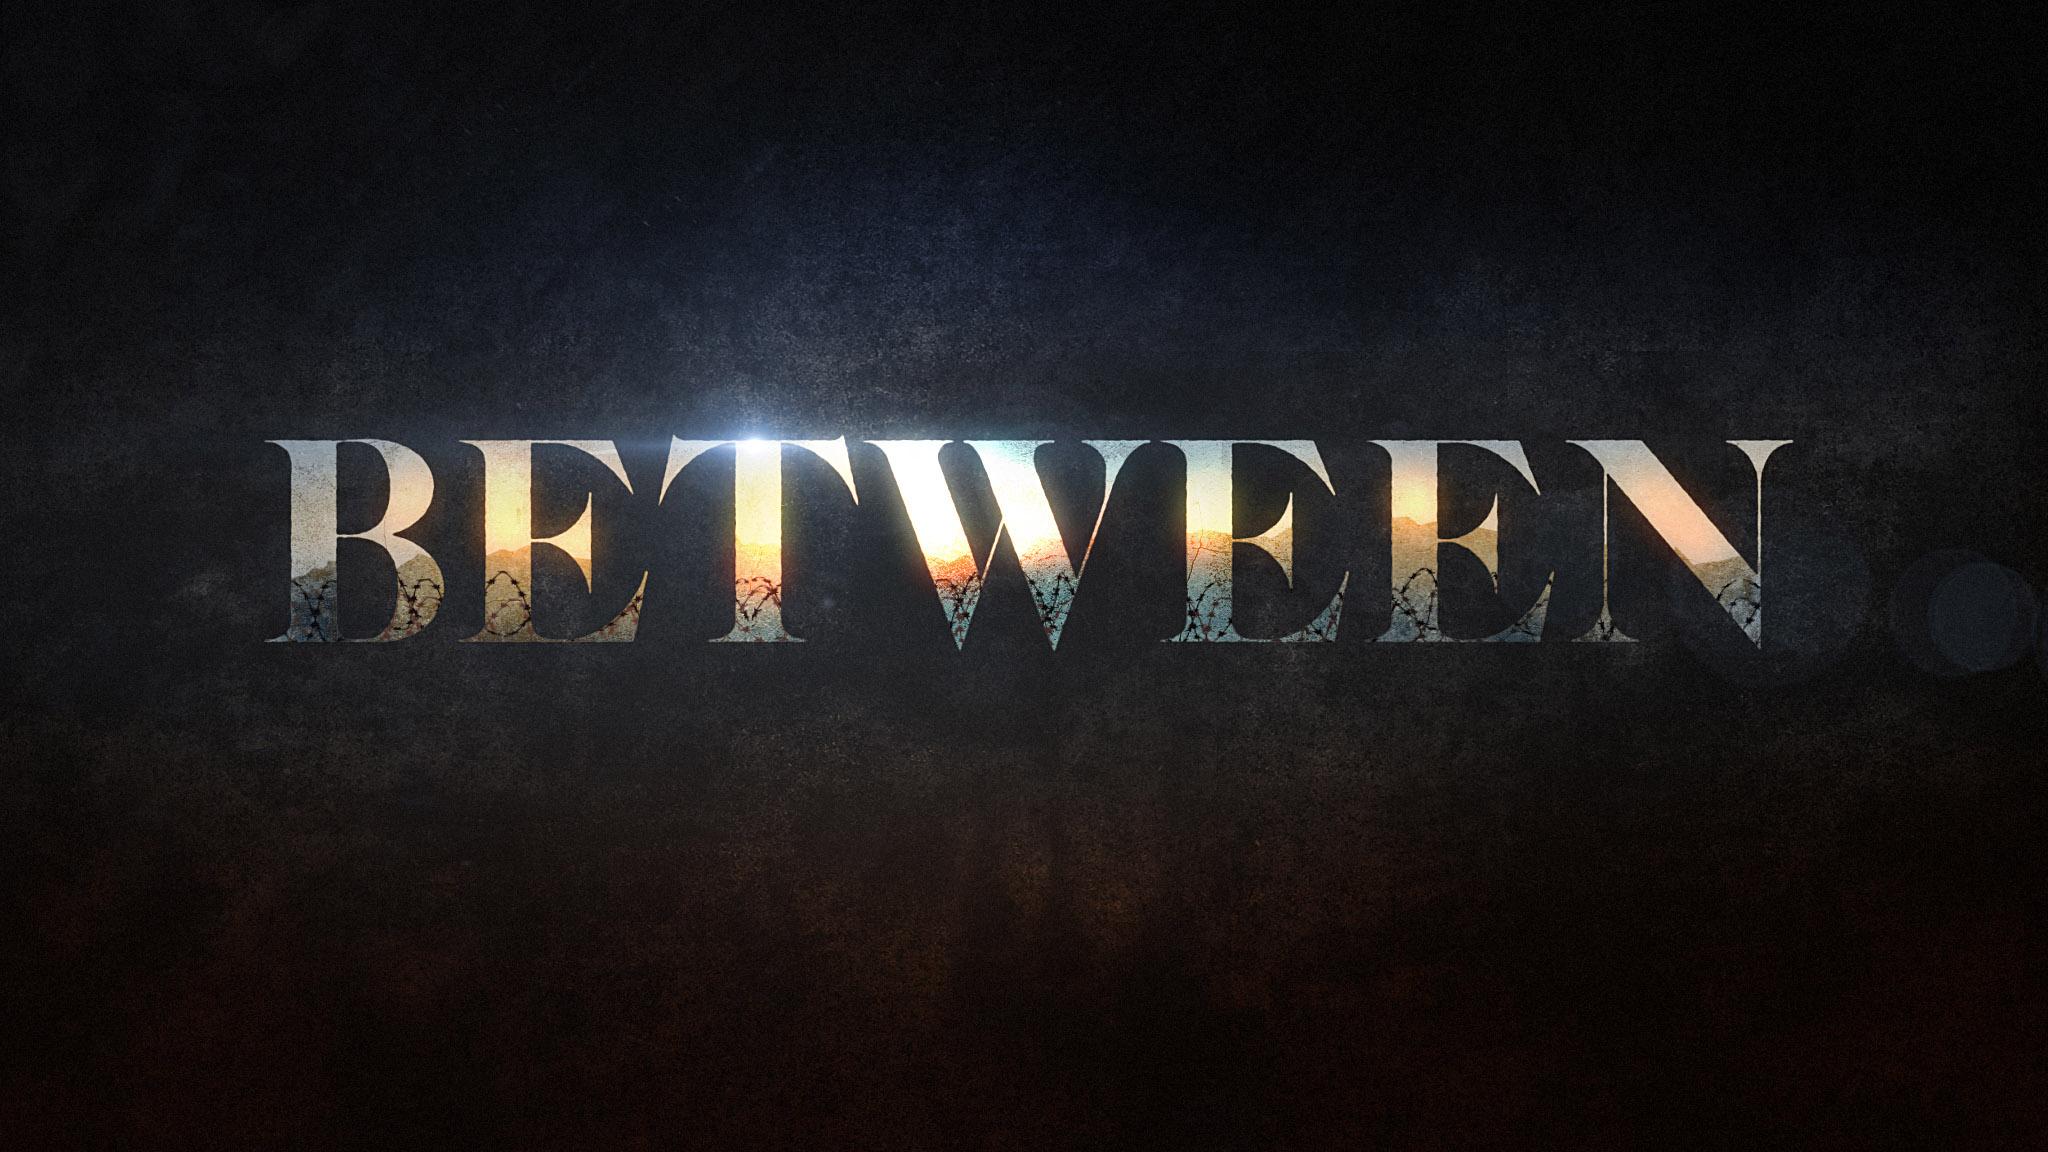 BTW_MT_BrBWire_v01_Bh_web.jpg